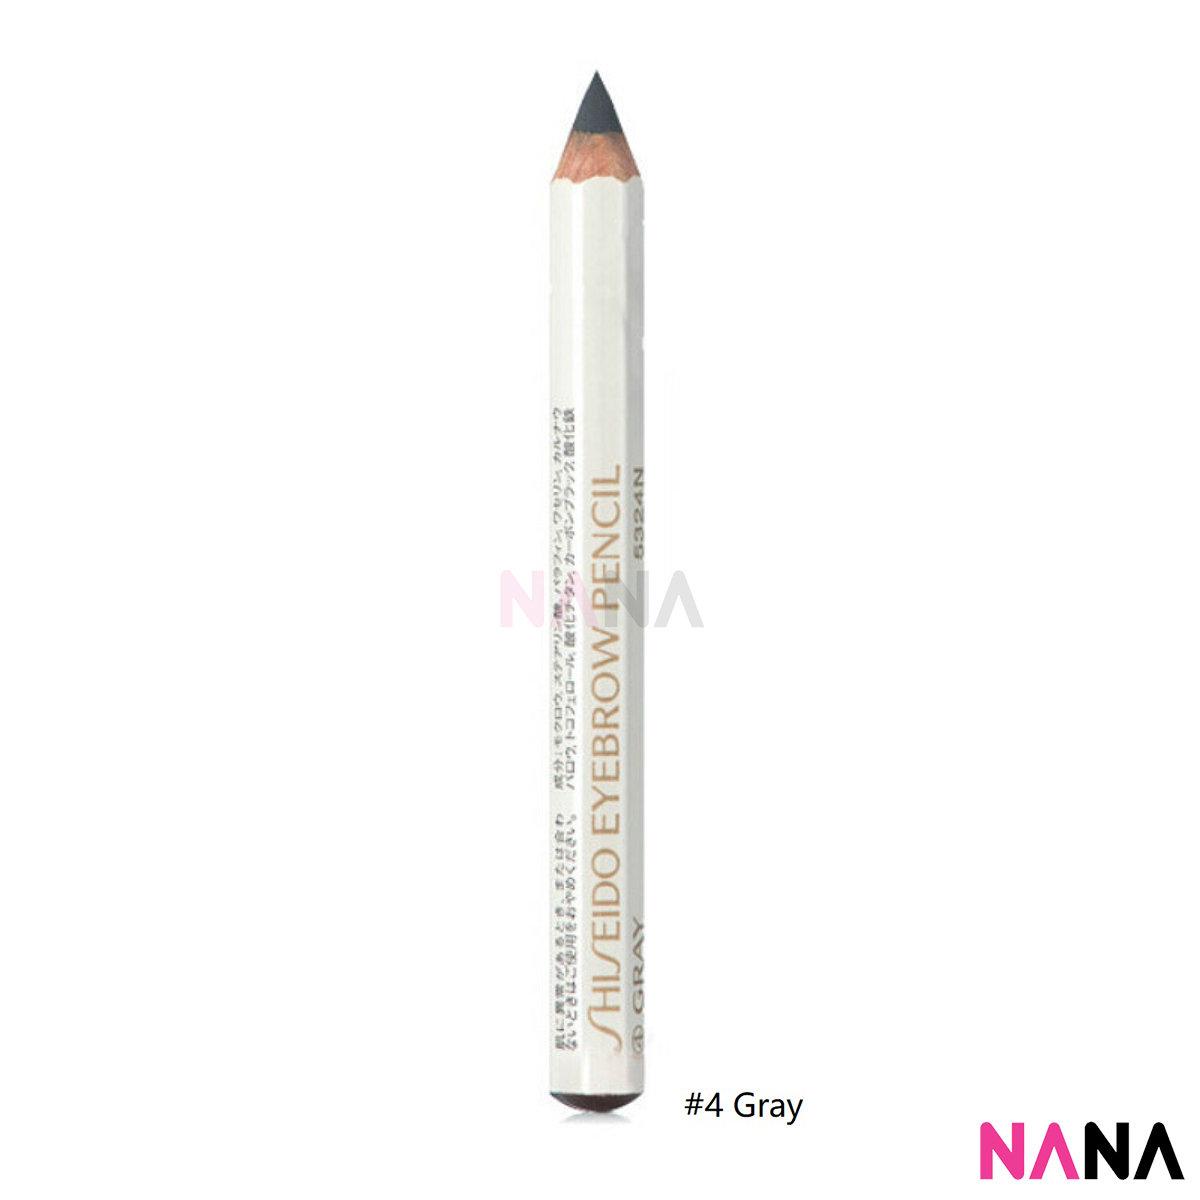 Eyebrow Pencil #4 Gray